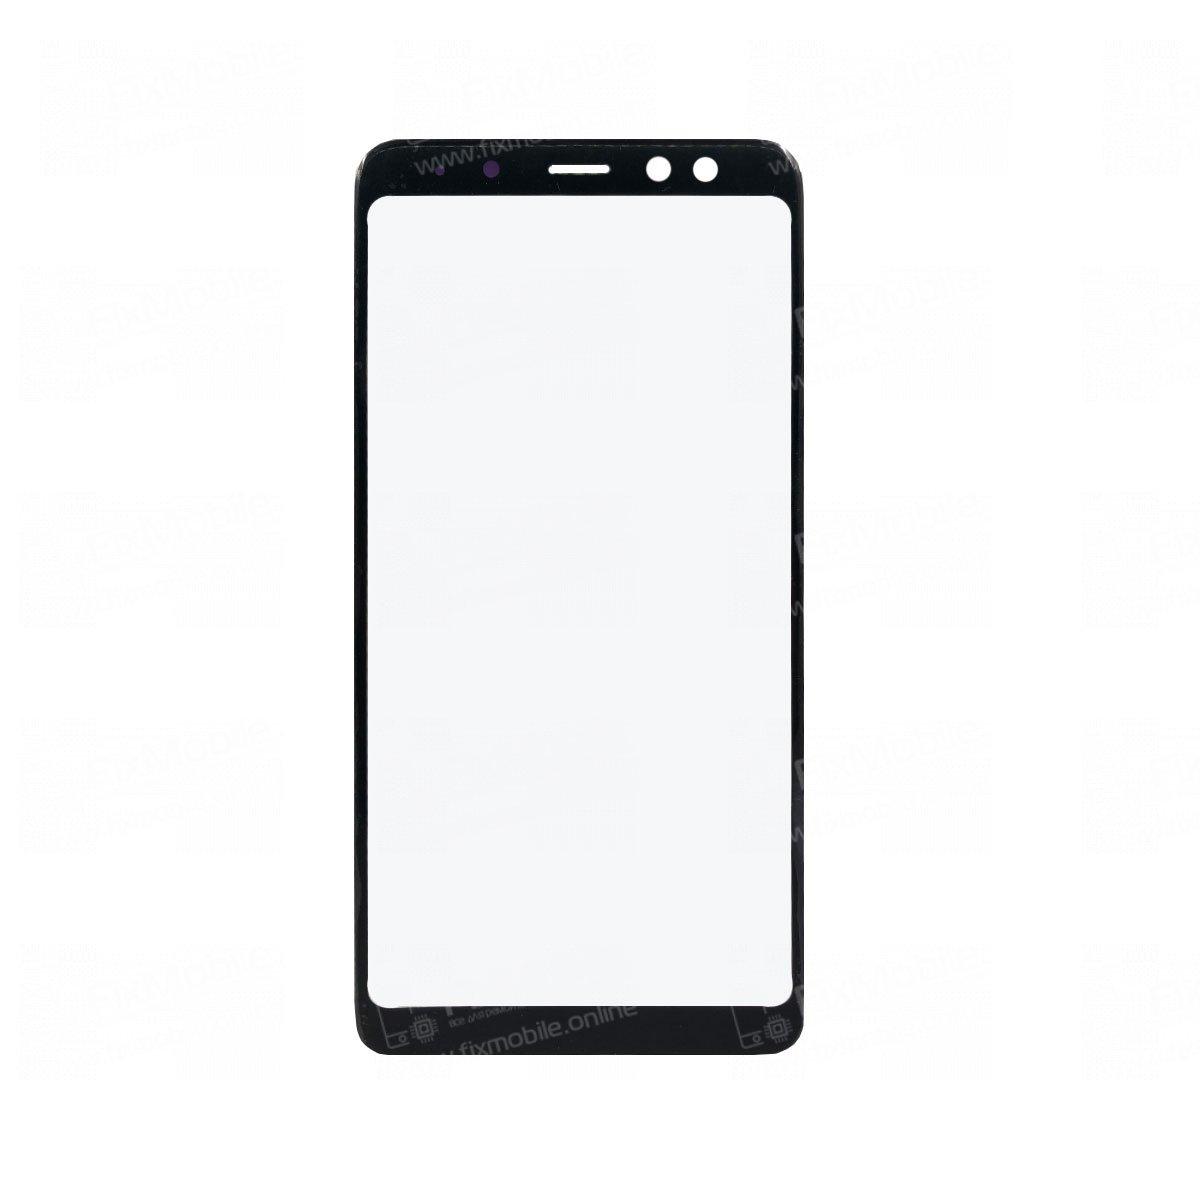 Стекло для Samsung Galaxy A5 (2016) A510F (черное)